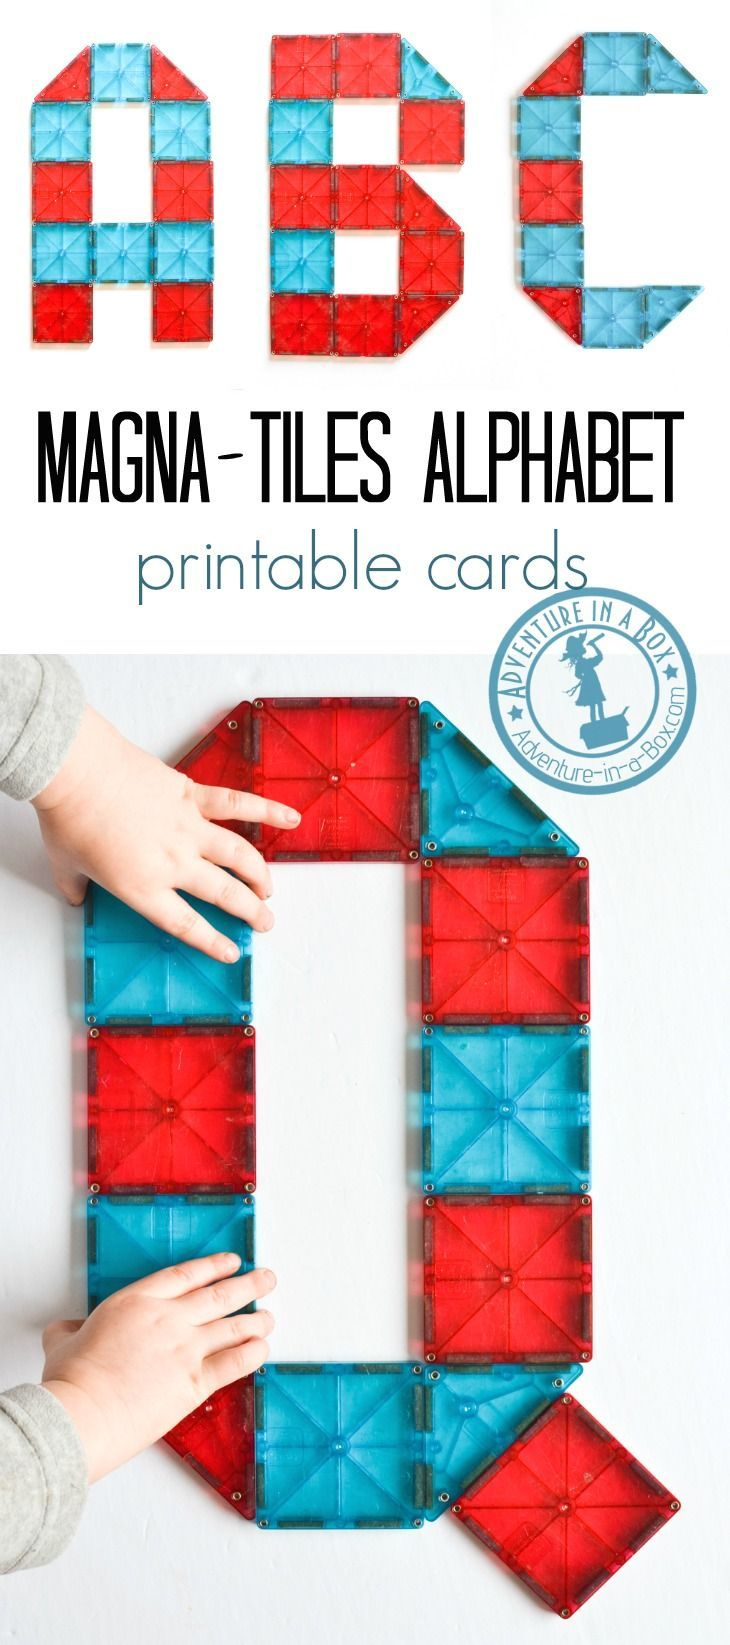 MagnaTiles Uppercase Alphabet Printable Cards    Free